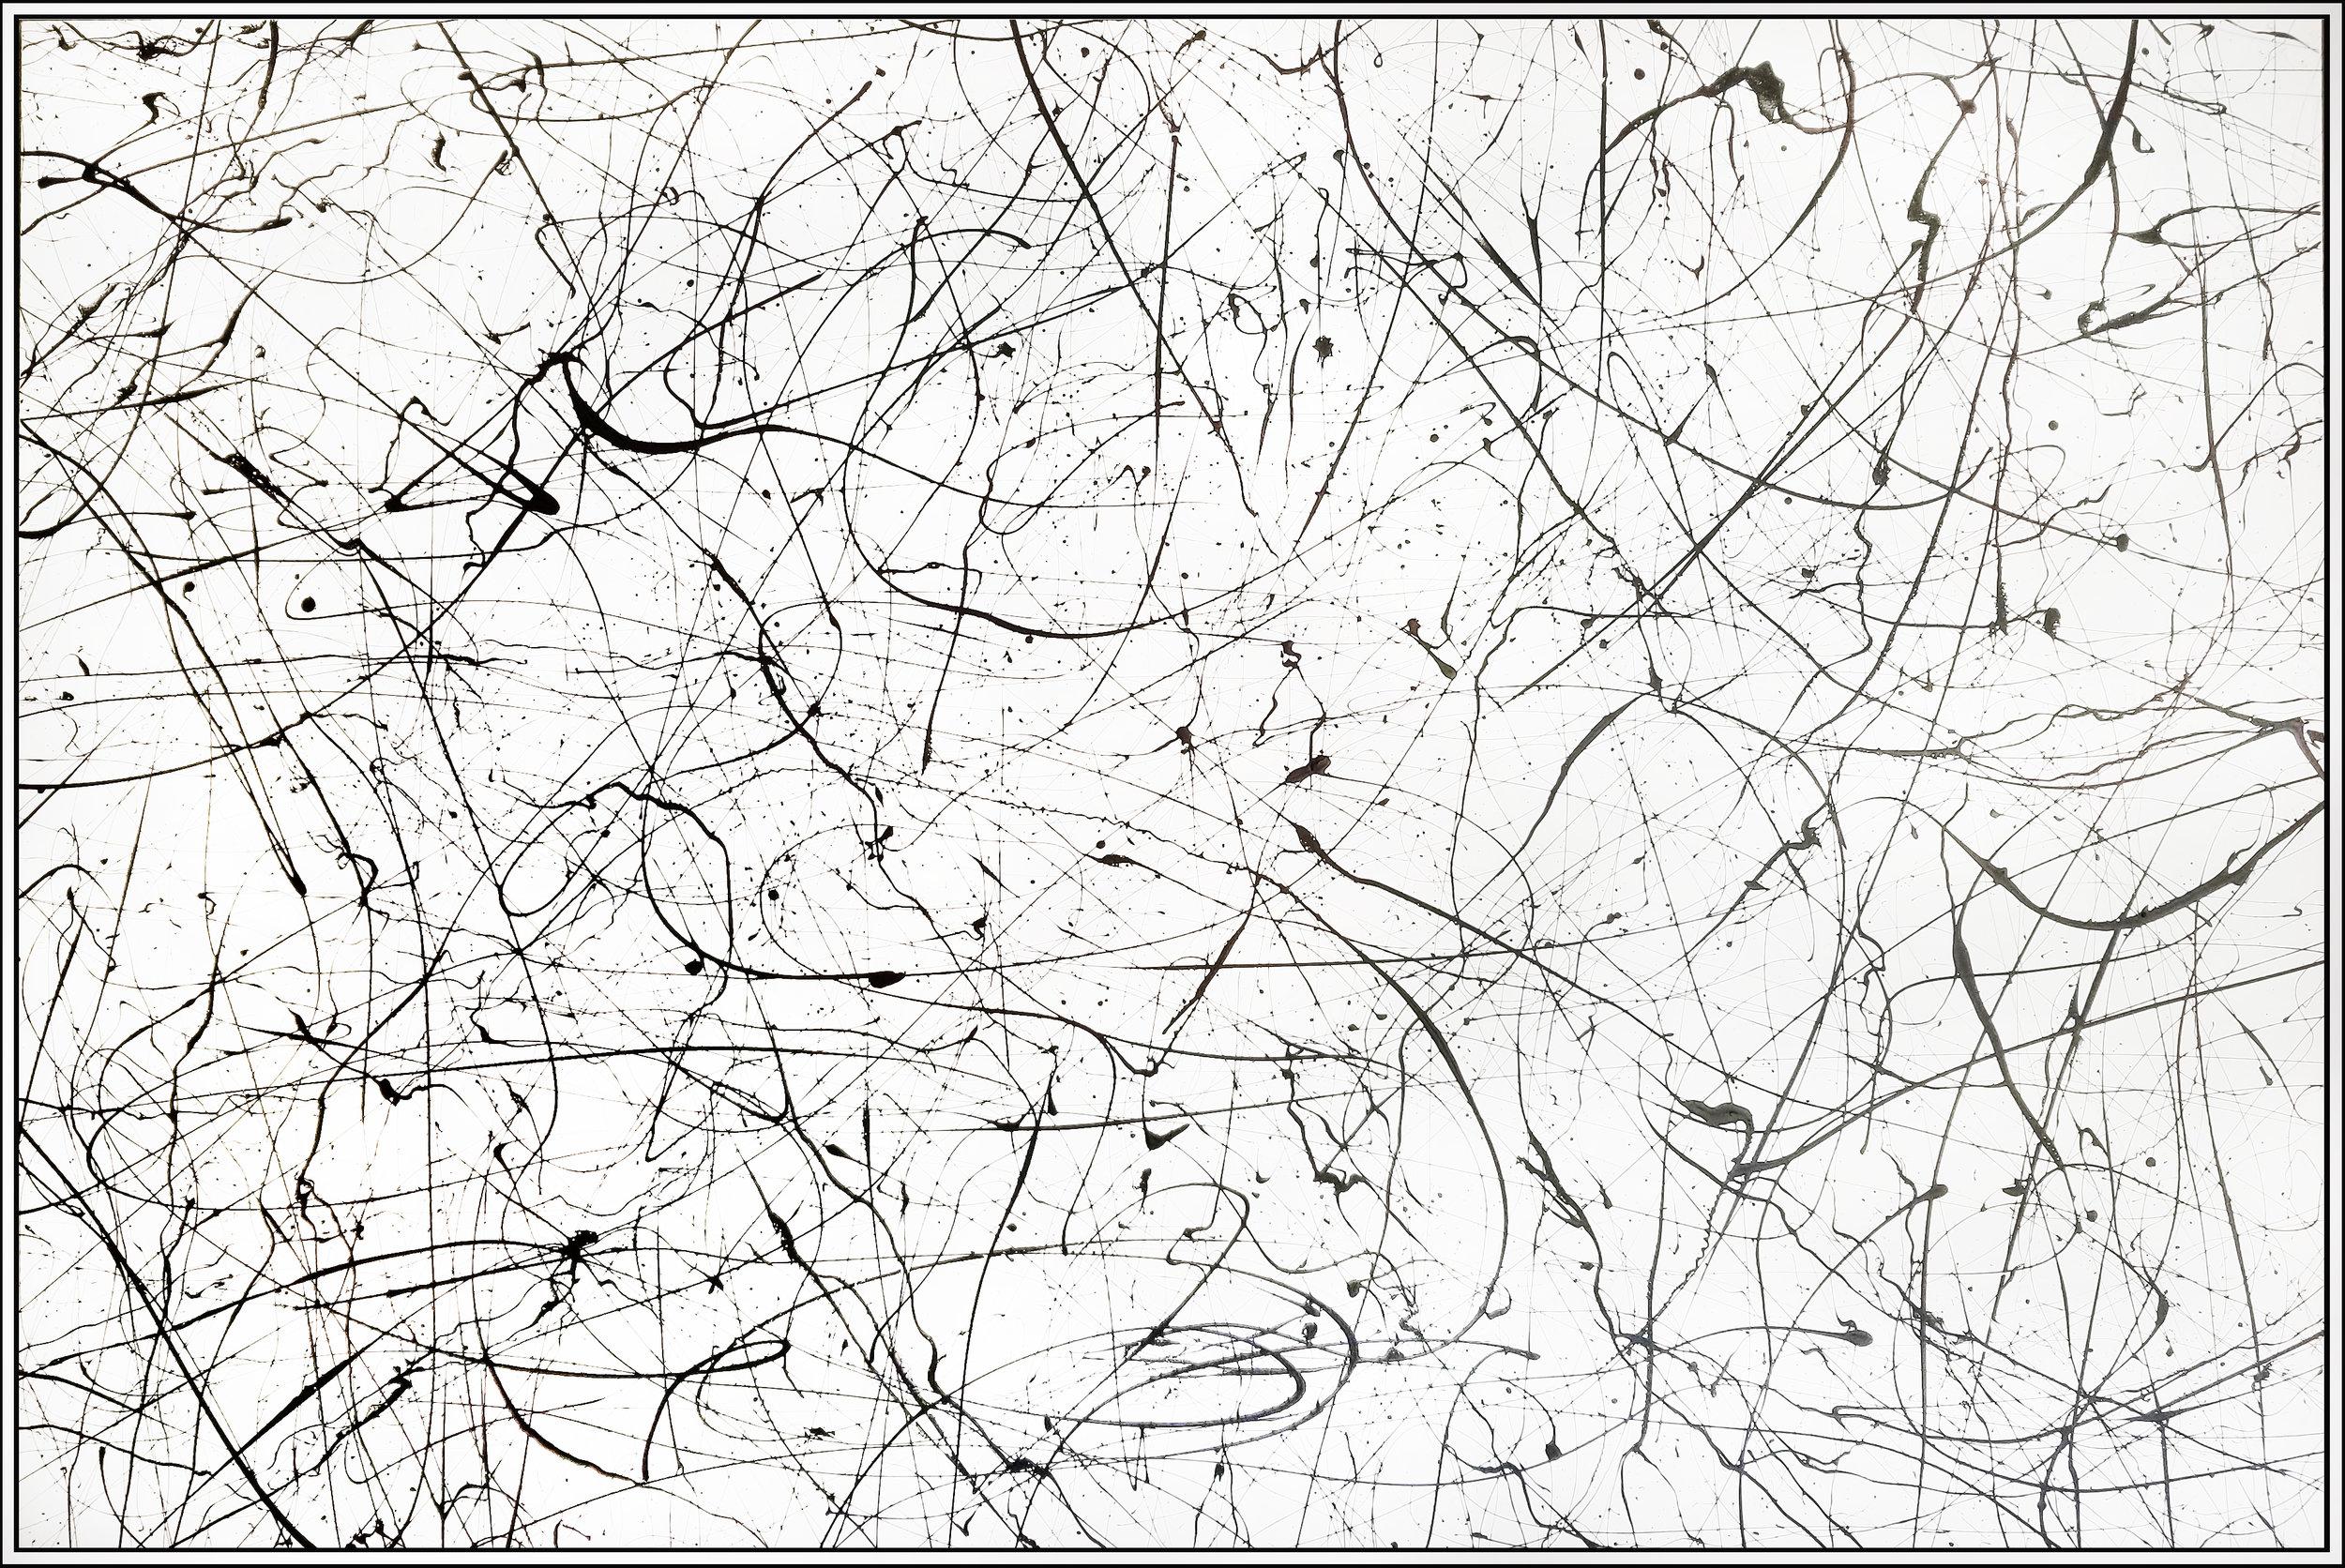 "Winter Paradise #14, 2018, acrylic on canvas, 48"" x 72"" (122 x 183 cm)"